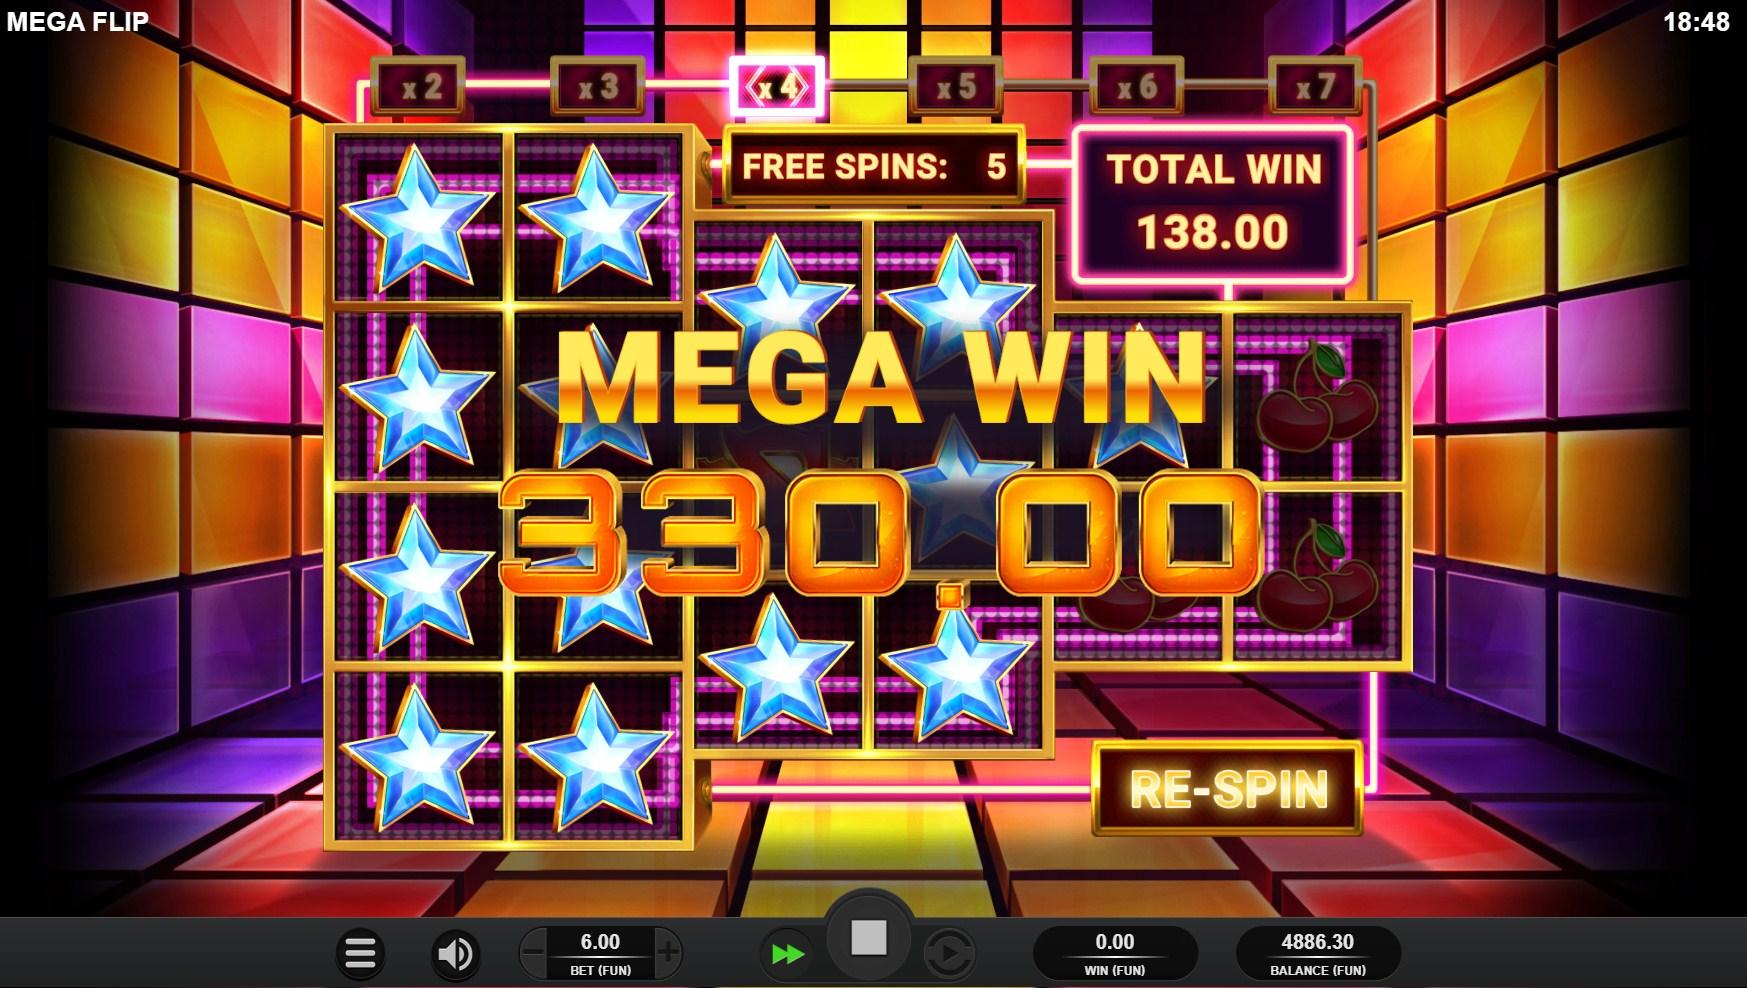 mega-flip-slot-bonus